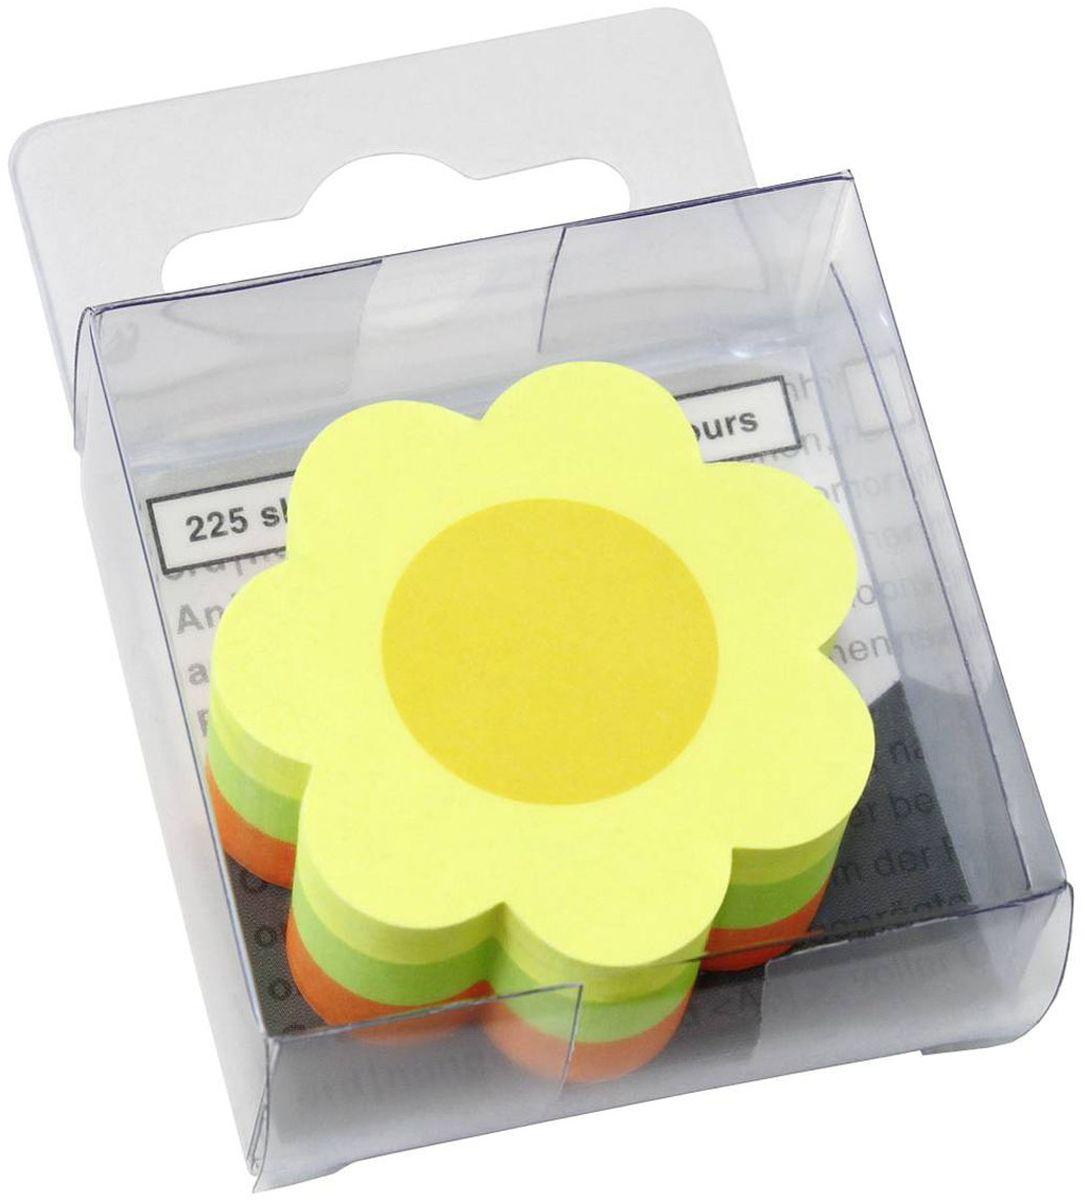 Global Notes Бумага для заметок с липким слоем Цветок 5 х 5 см 225 листов berlingo бумага для заметок c клеевым краем 7 6 х 7 6 см цвет зеленый 100 листов